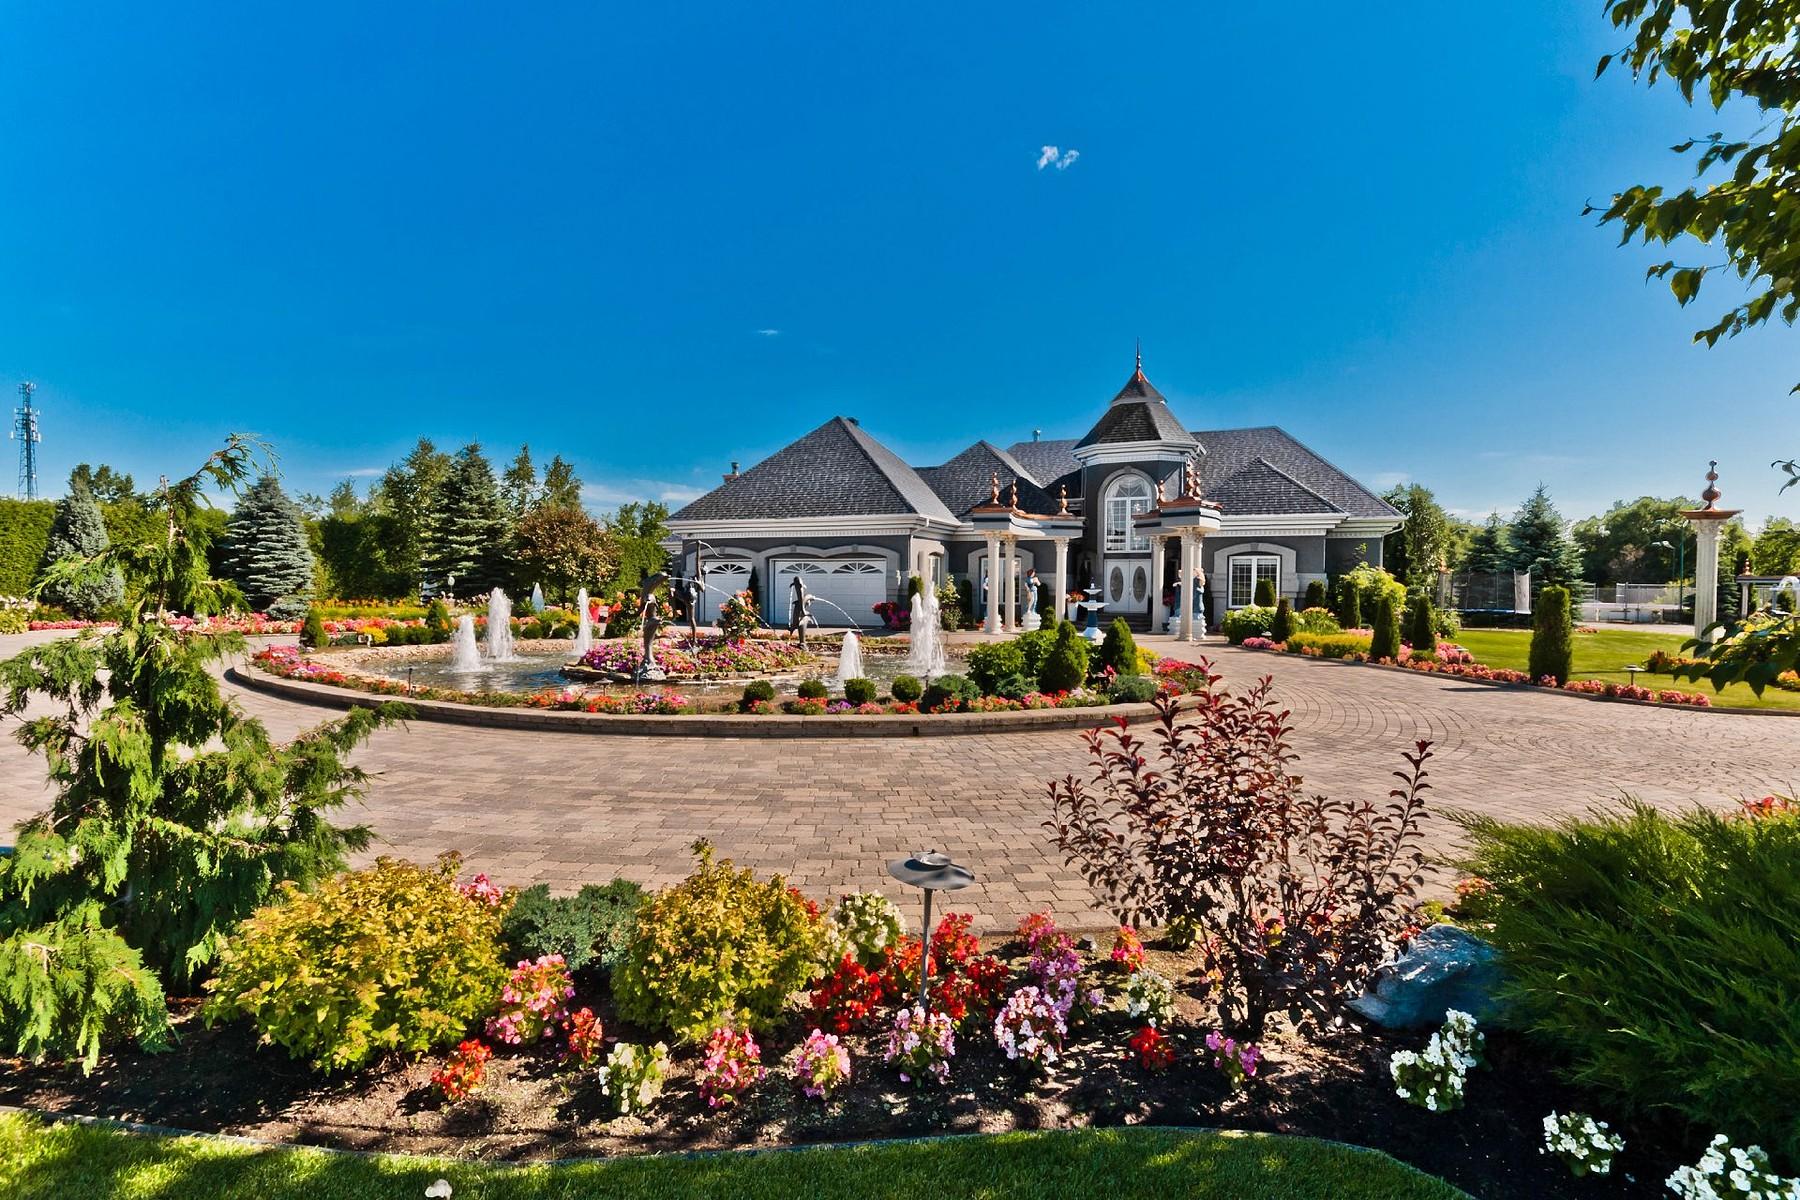 Частный односемейный дом для того Продажа на La Plaine (Terrebonne), Lanaudière 5800 Ch. du Curé-Barrette La Plaine, Квебек J7M1N1 Канада